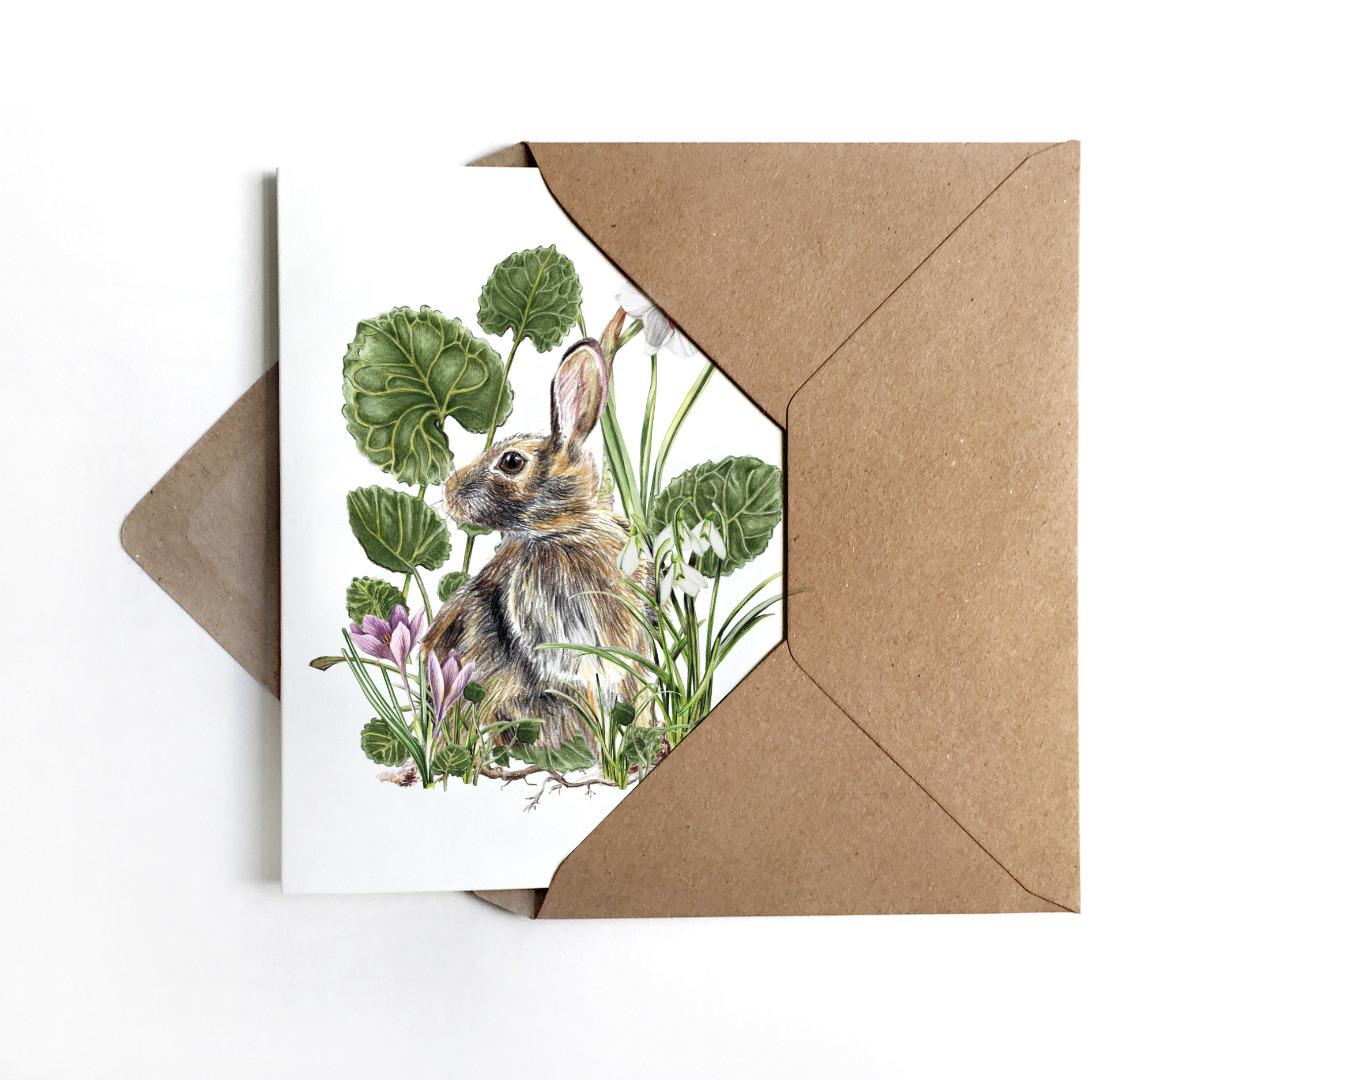 Grußkarte Hase mit Frühjahrsblühern Osterkarte